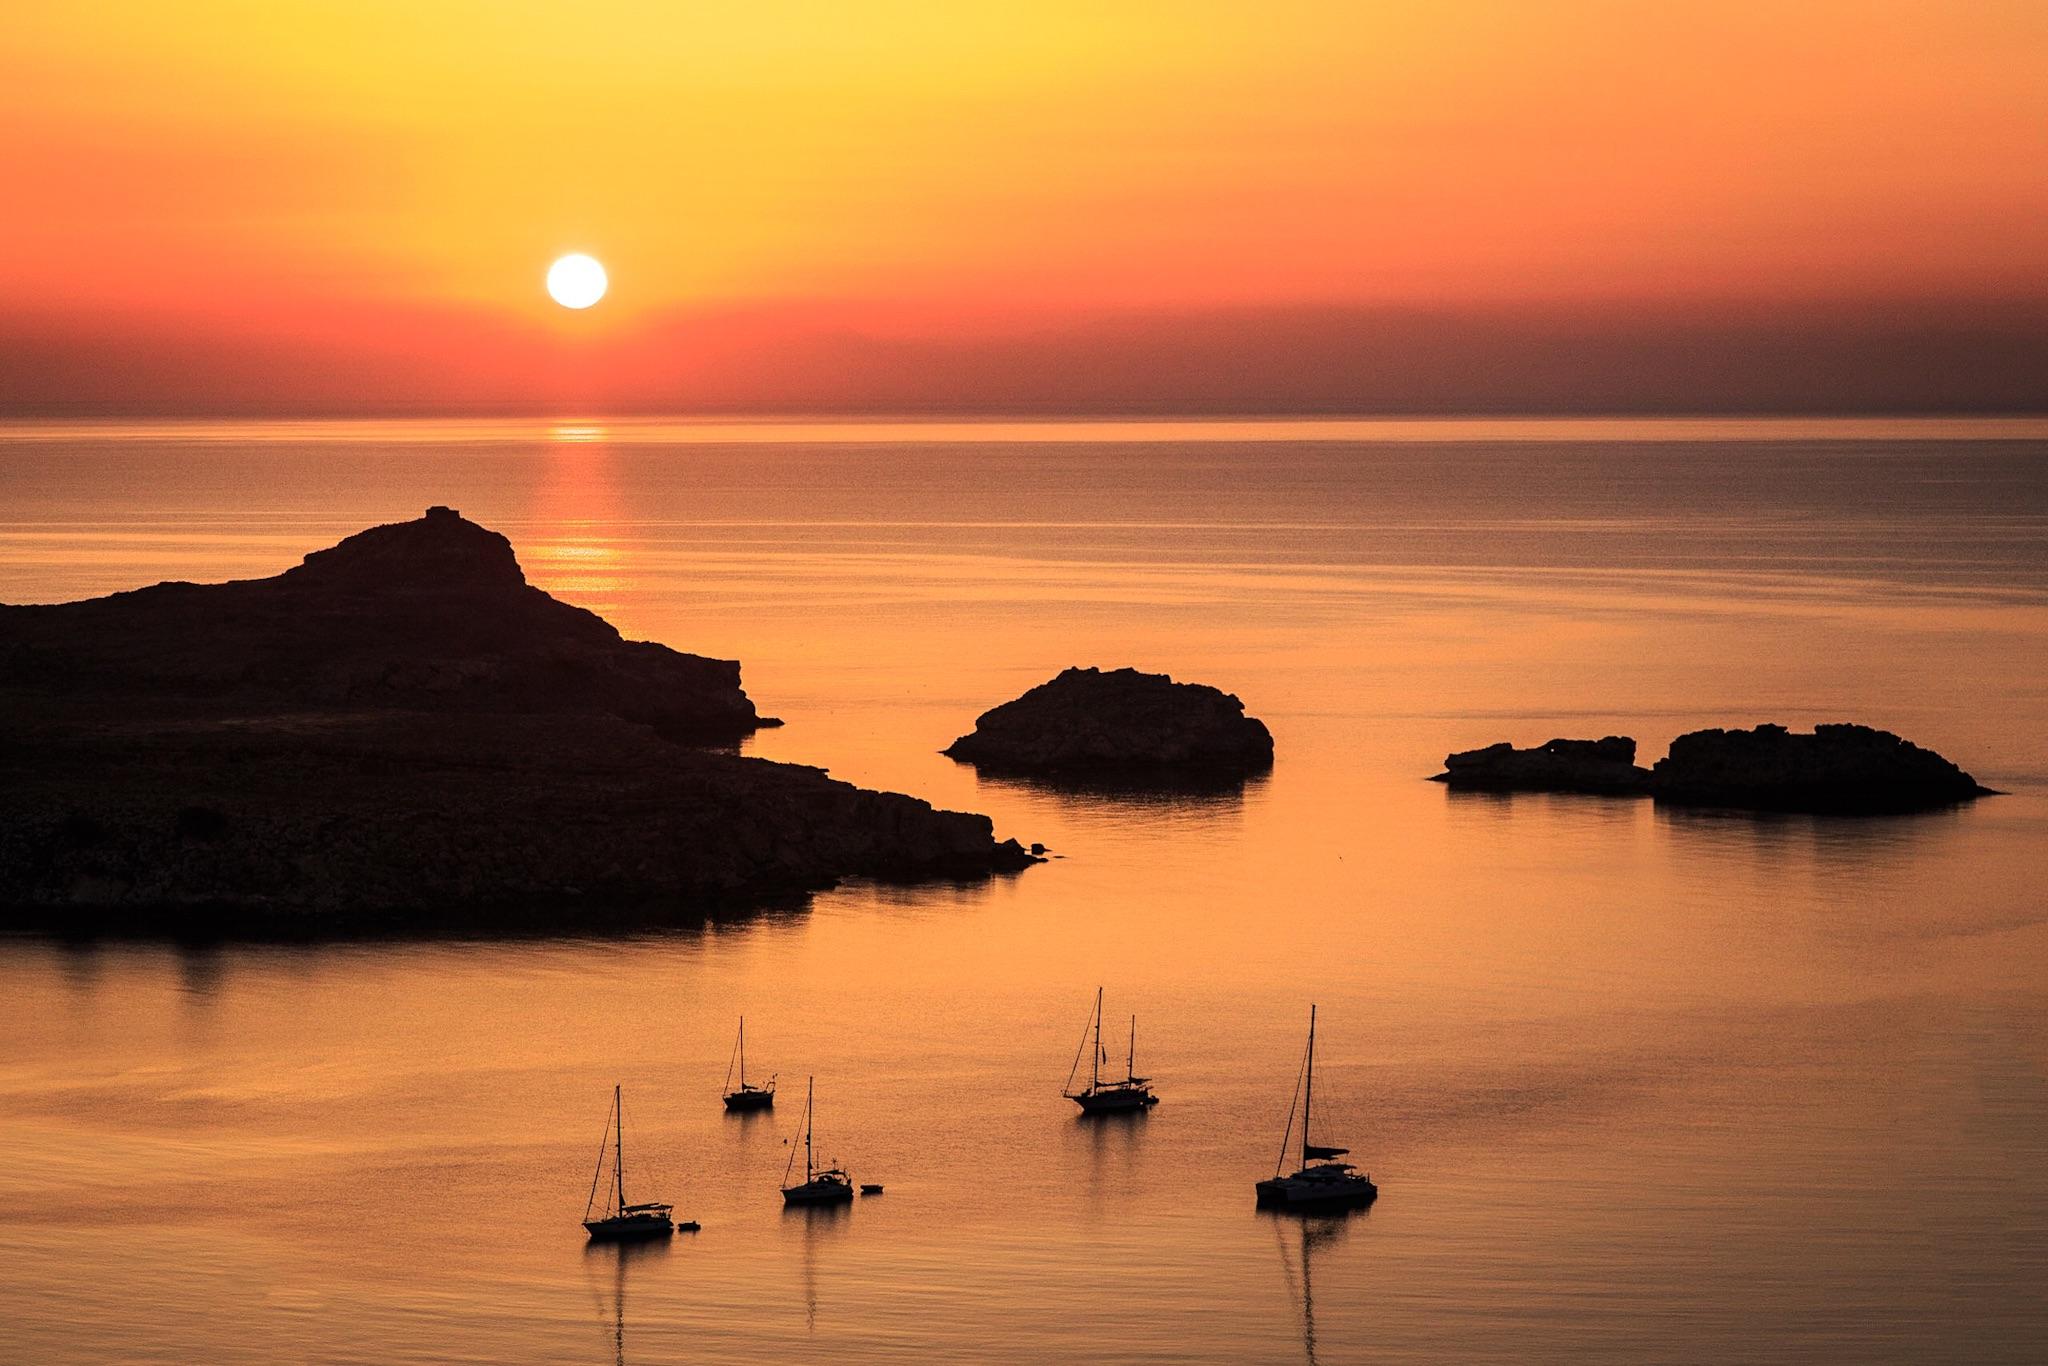 Lindos Bay at sunrise by travel photographer Rick McEvoy